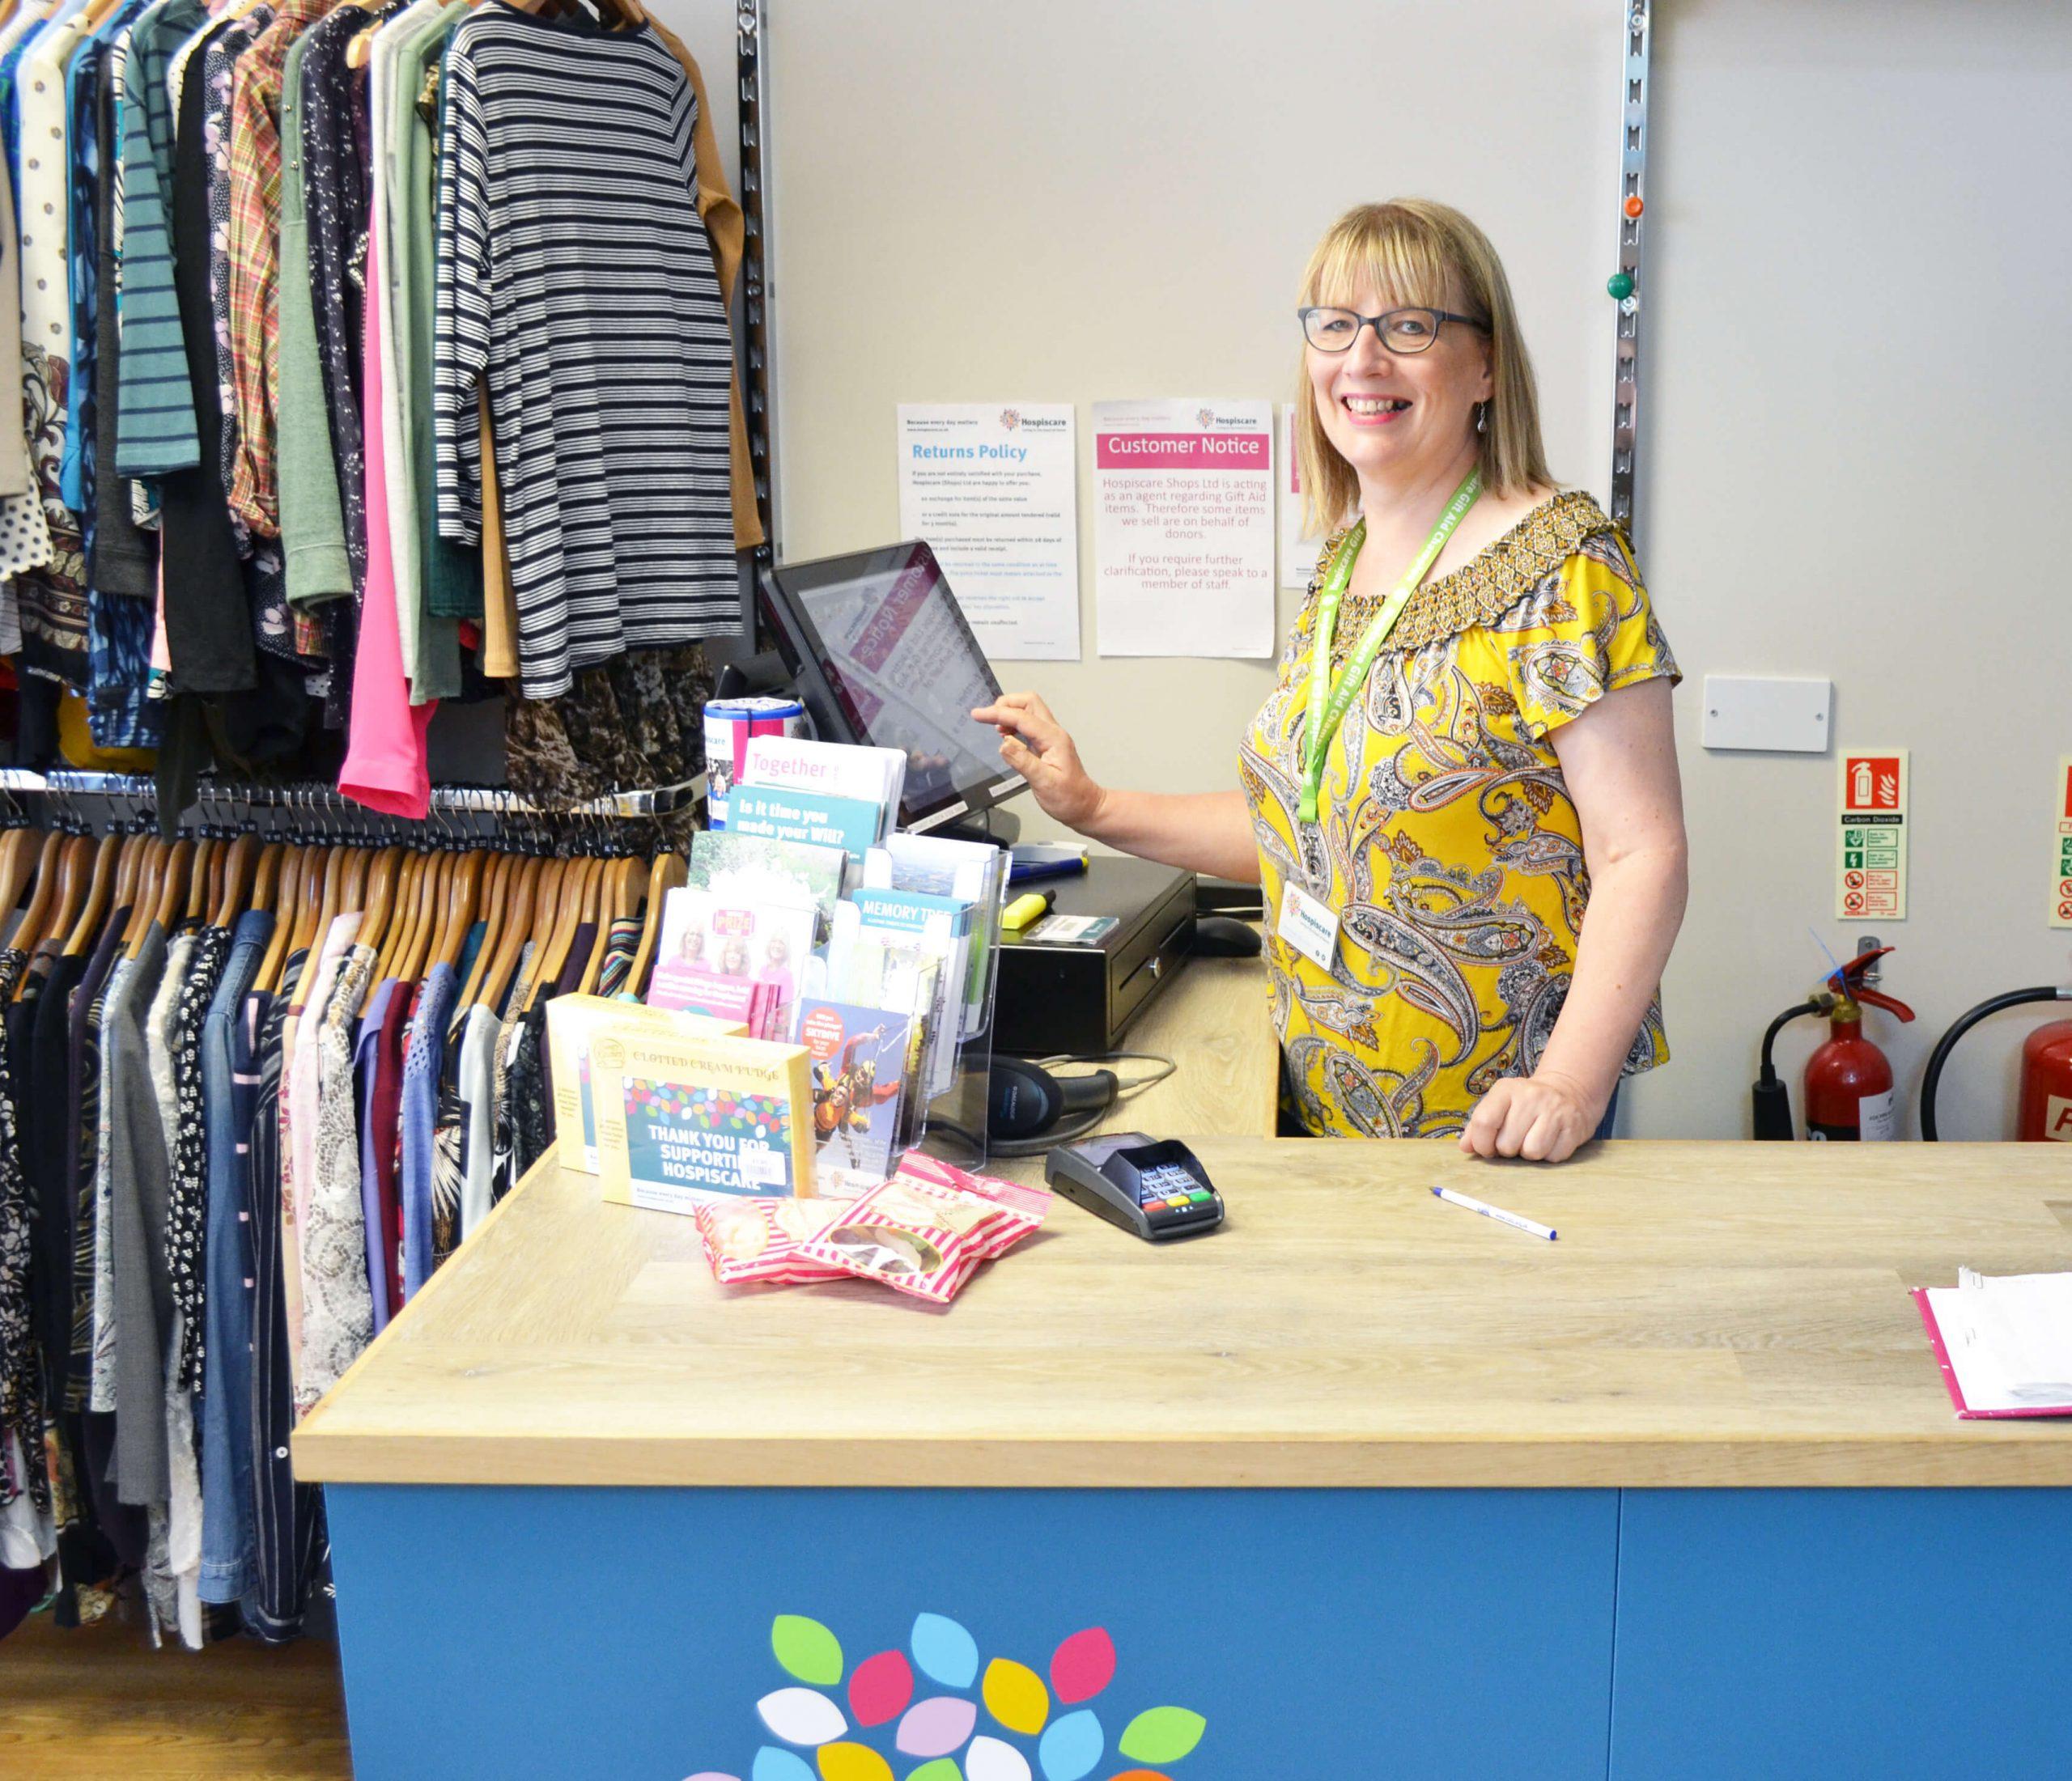 Liz Crosfield volunteering in her local Hospiscare shop in Seaton.